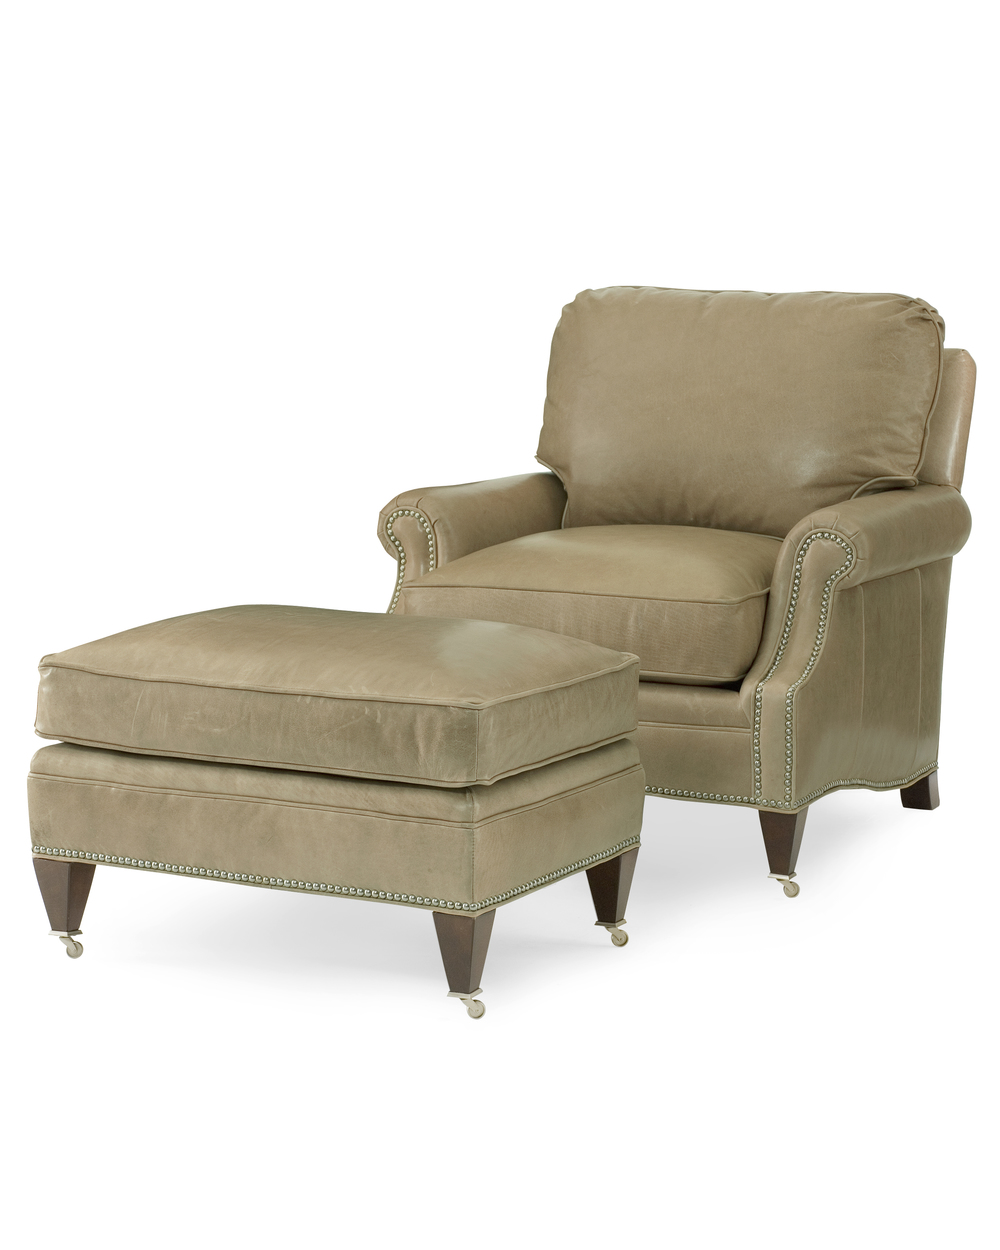 Century Furniture - Essex Chair and Ottoman